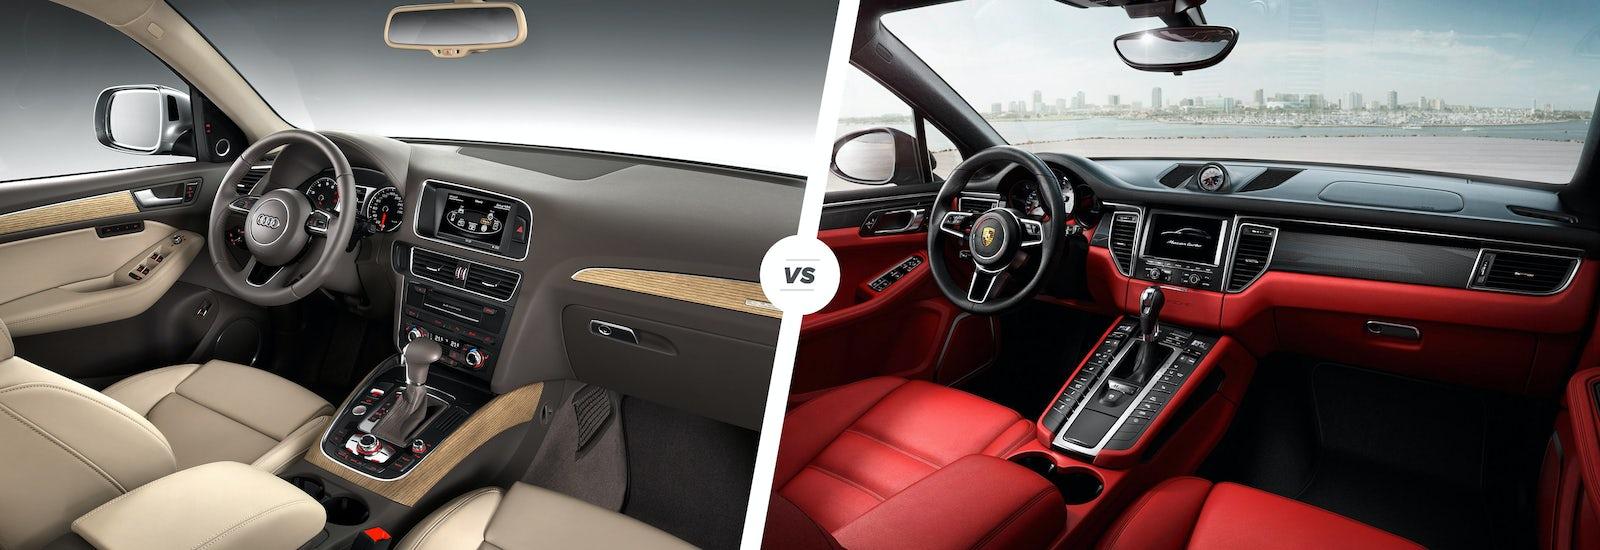 Audi Q Vs Porsche Macan Clash Of The SUVs Carwow - Audi q5 interior